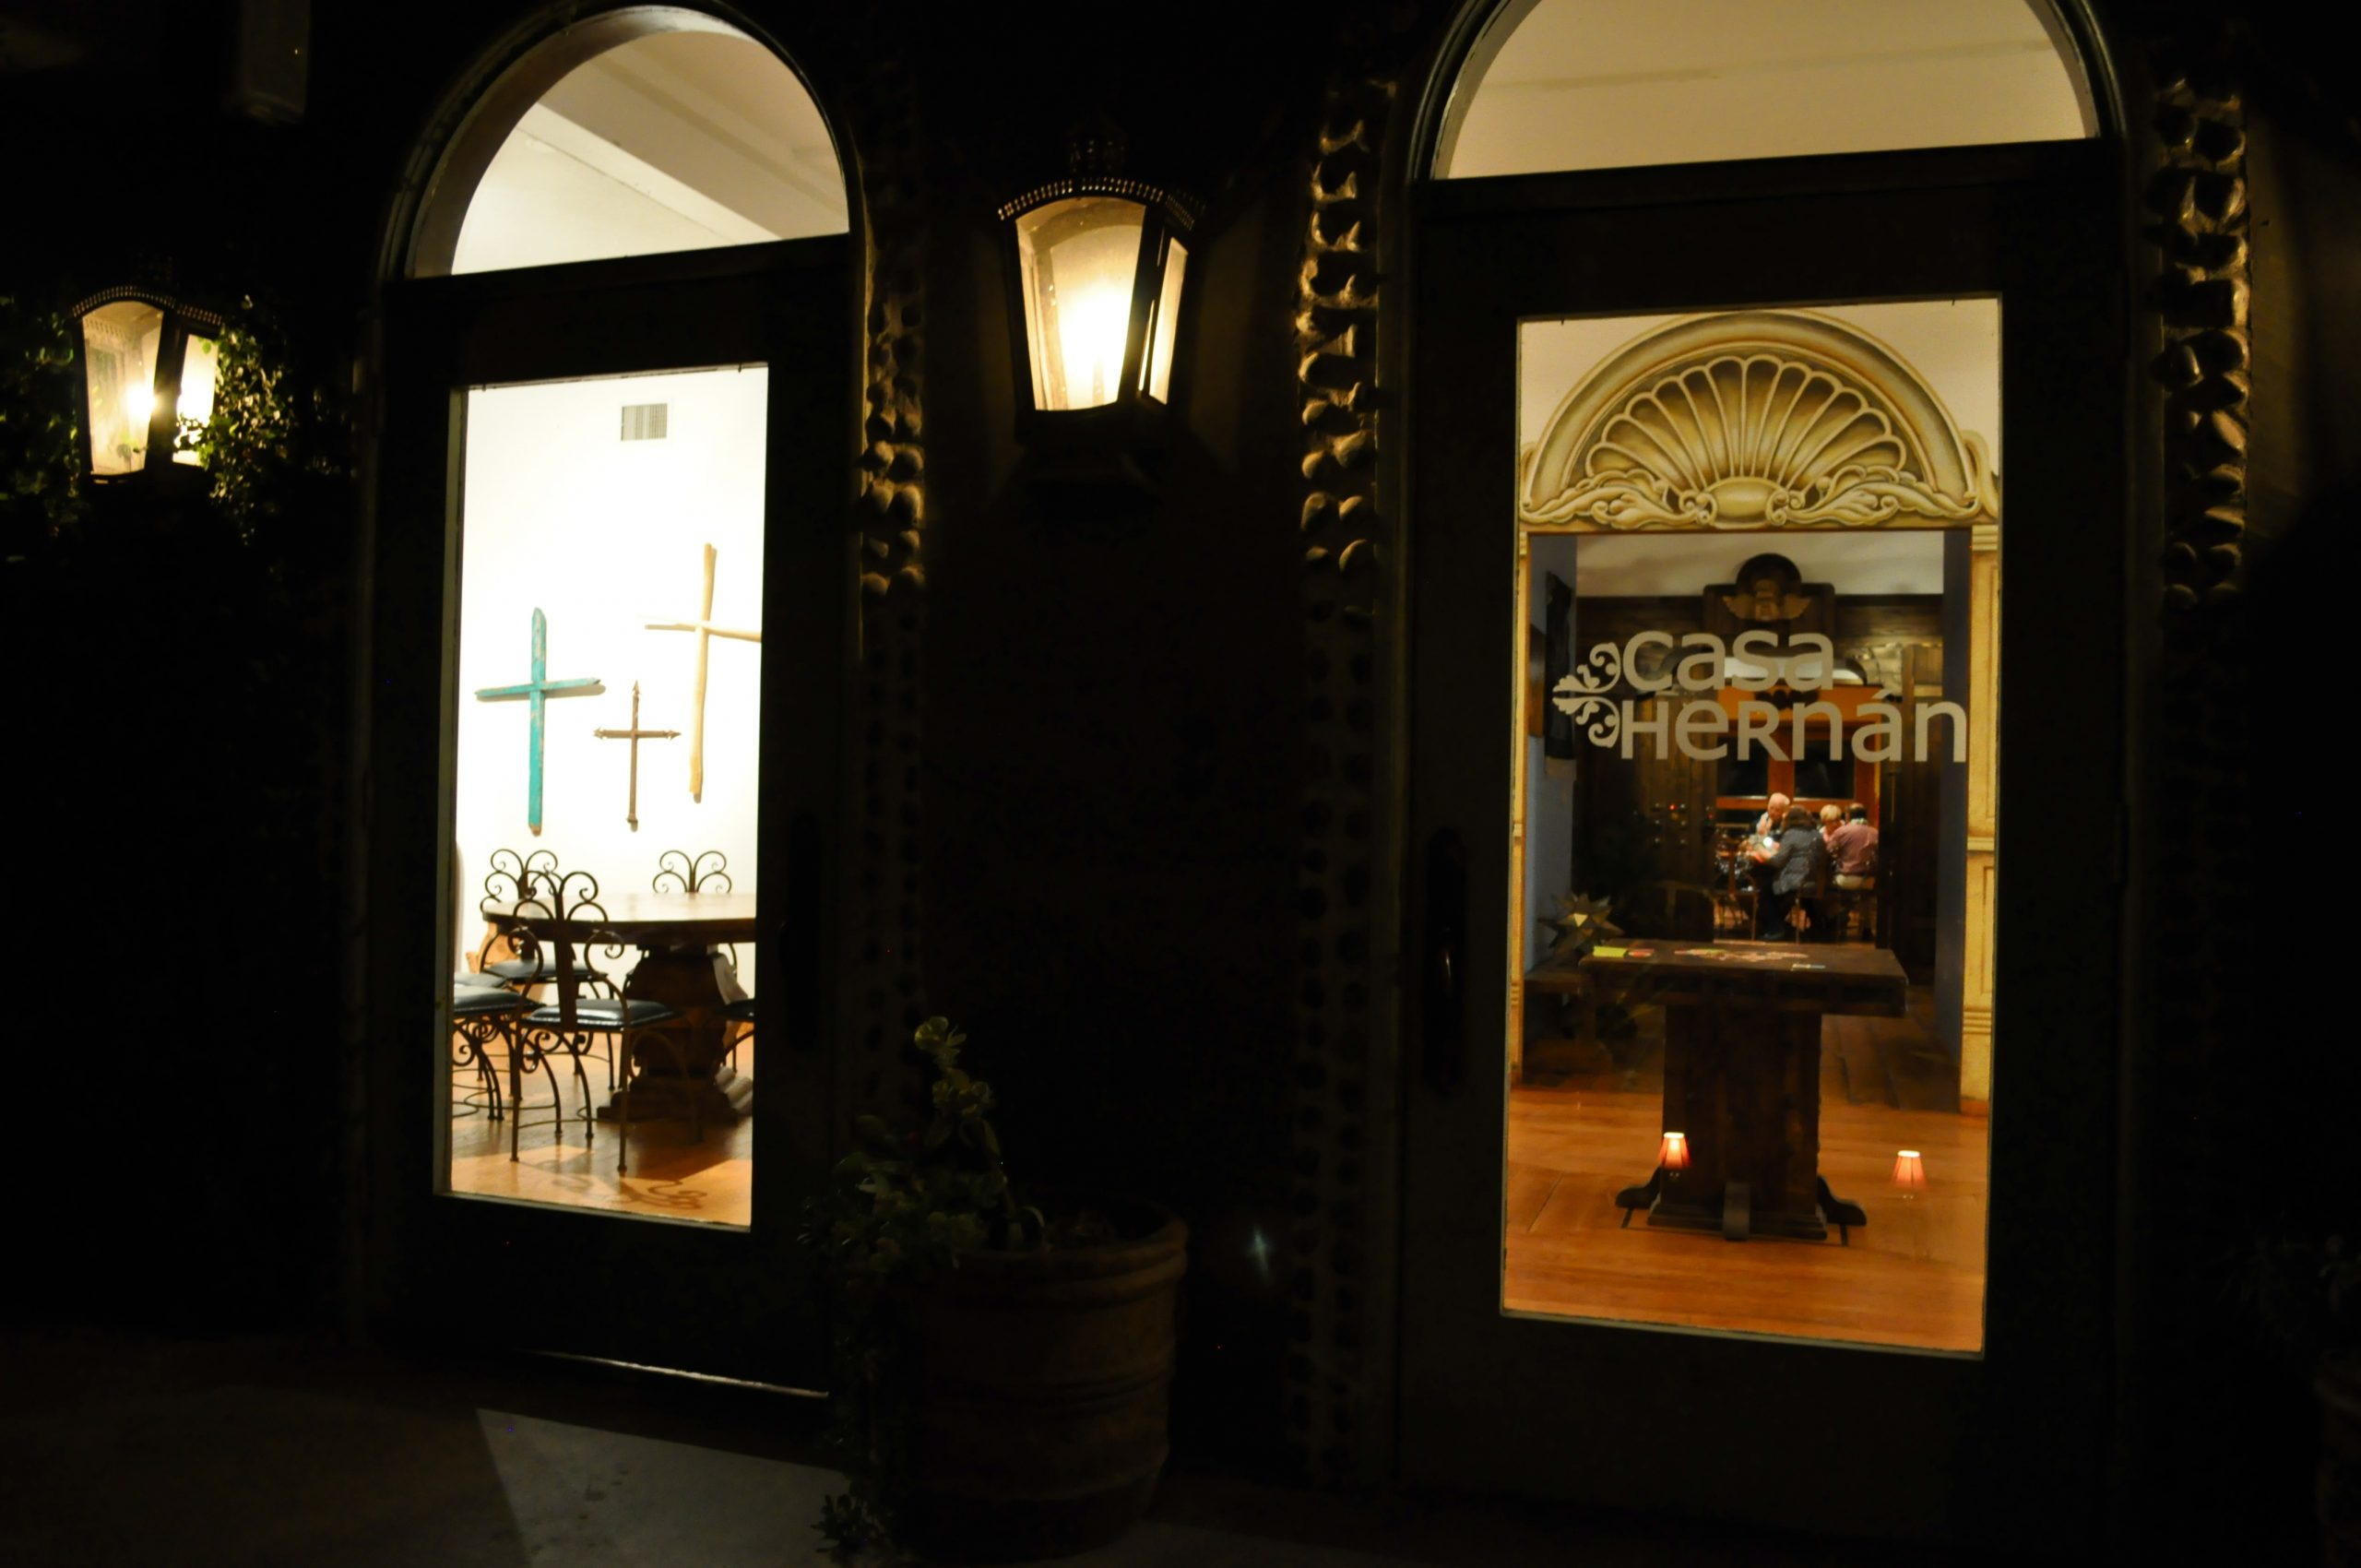 Chef Johnny Hernandez' Casa Hernan. Photo by Iris Dimmick.